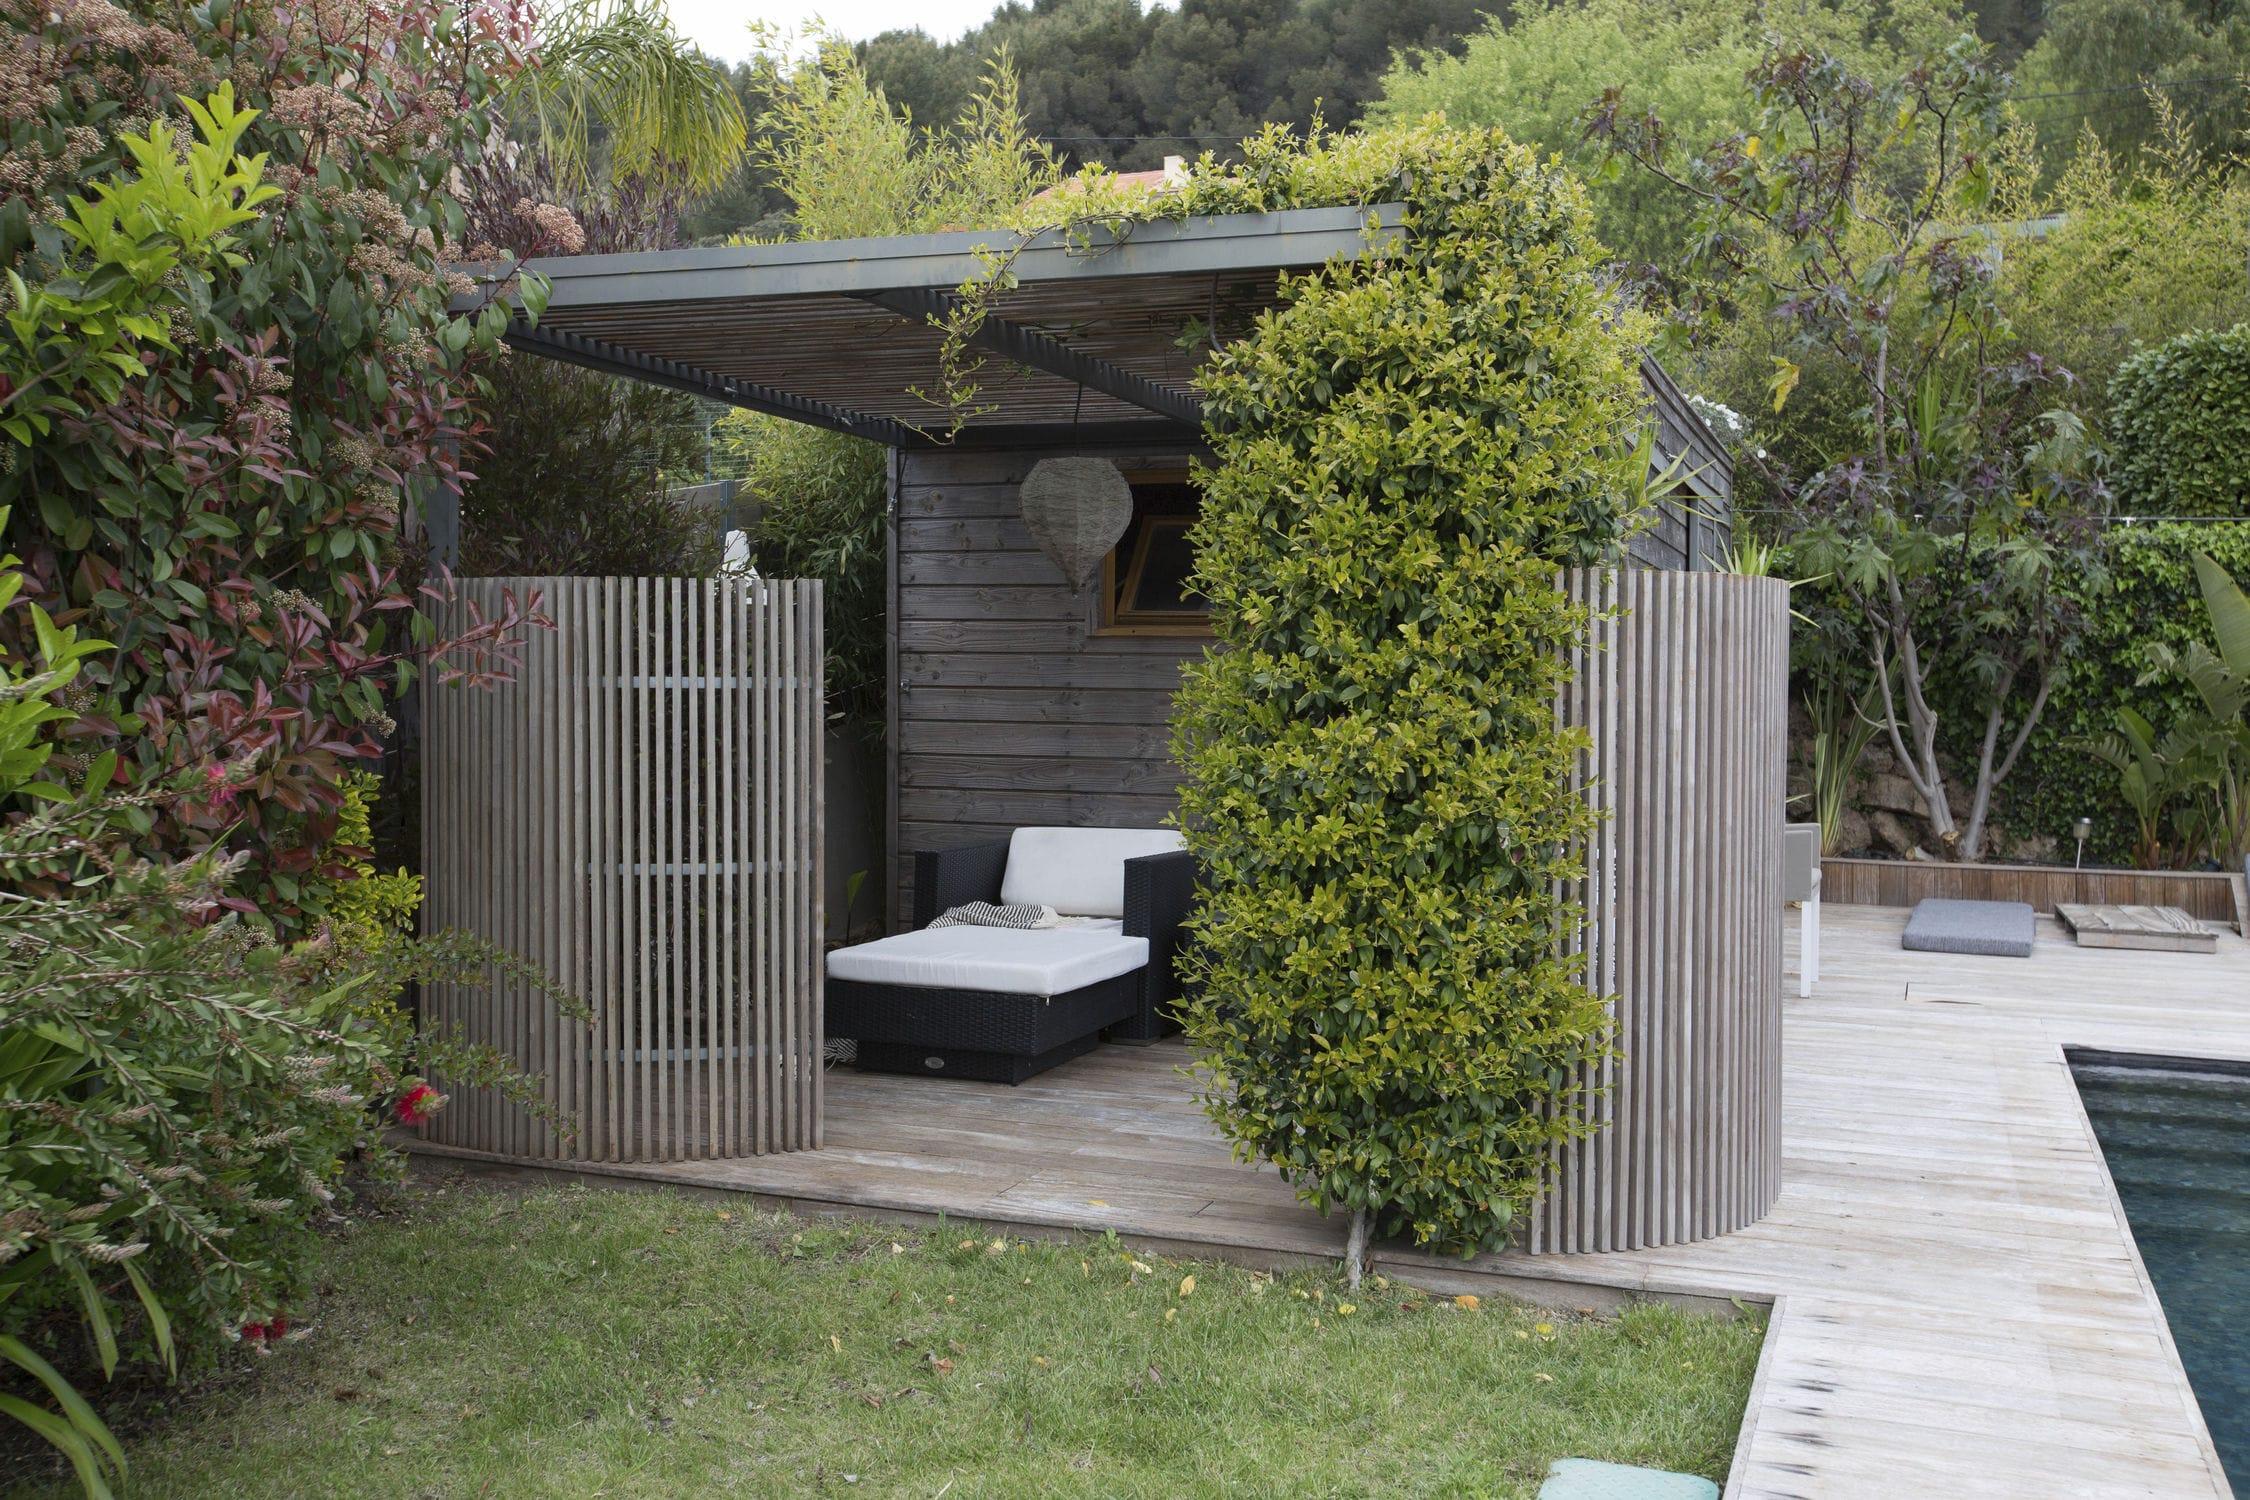 Holz Gitterstein Terrassen Garten nach Maß OUTDOOR KIT KURLY